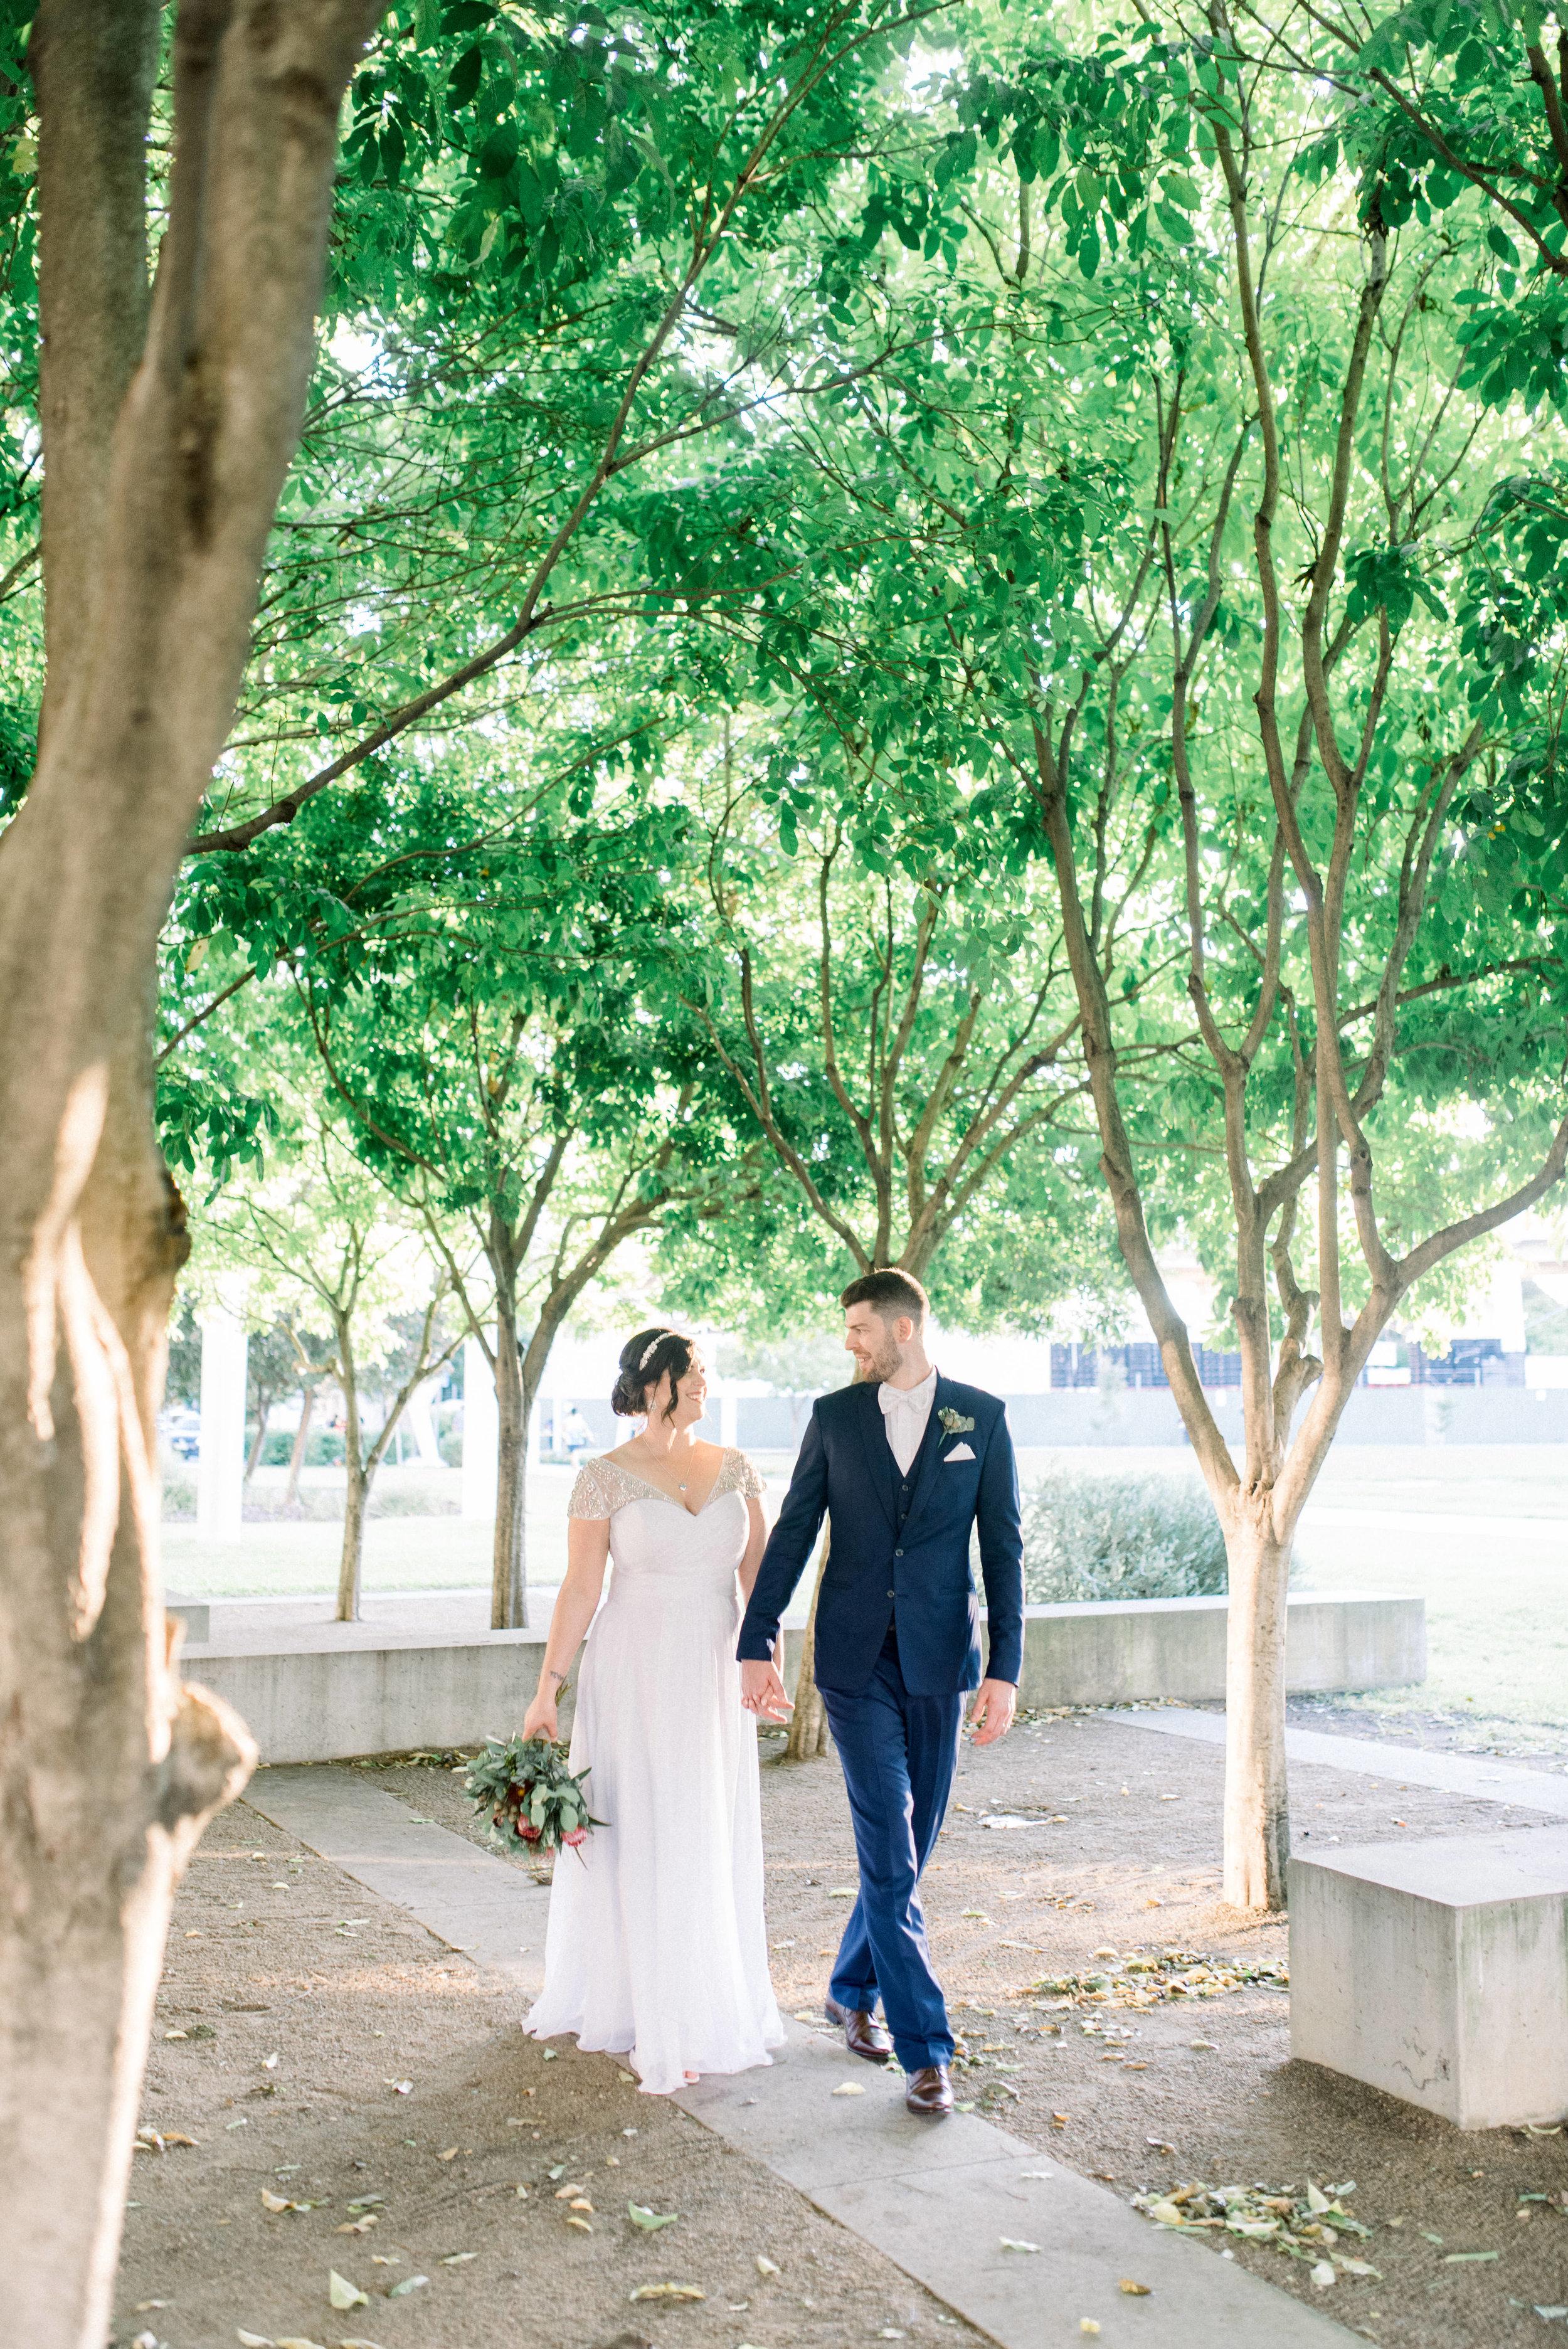 brisbane-city-wedding-photography-film-light-loft-westend-1-21.jpg